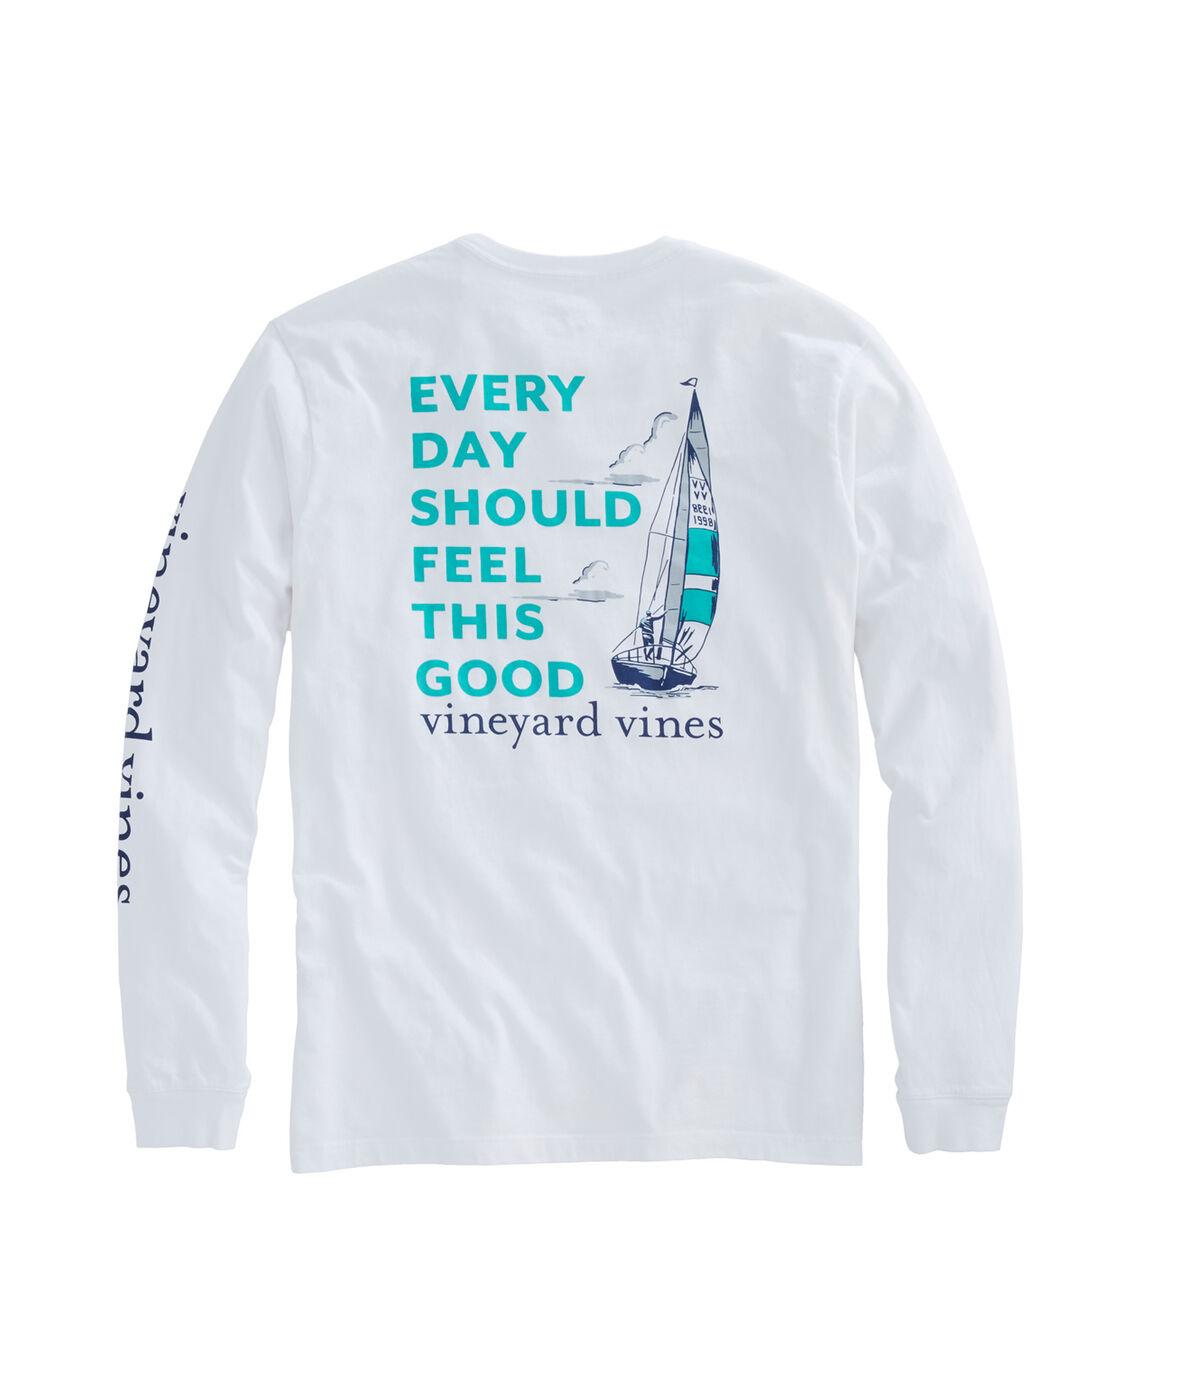 Shop Long-Sleeve EDSFTG Sailing T-Shirt at vineyard vines